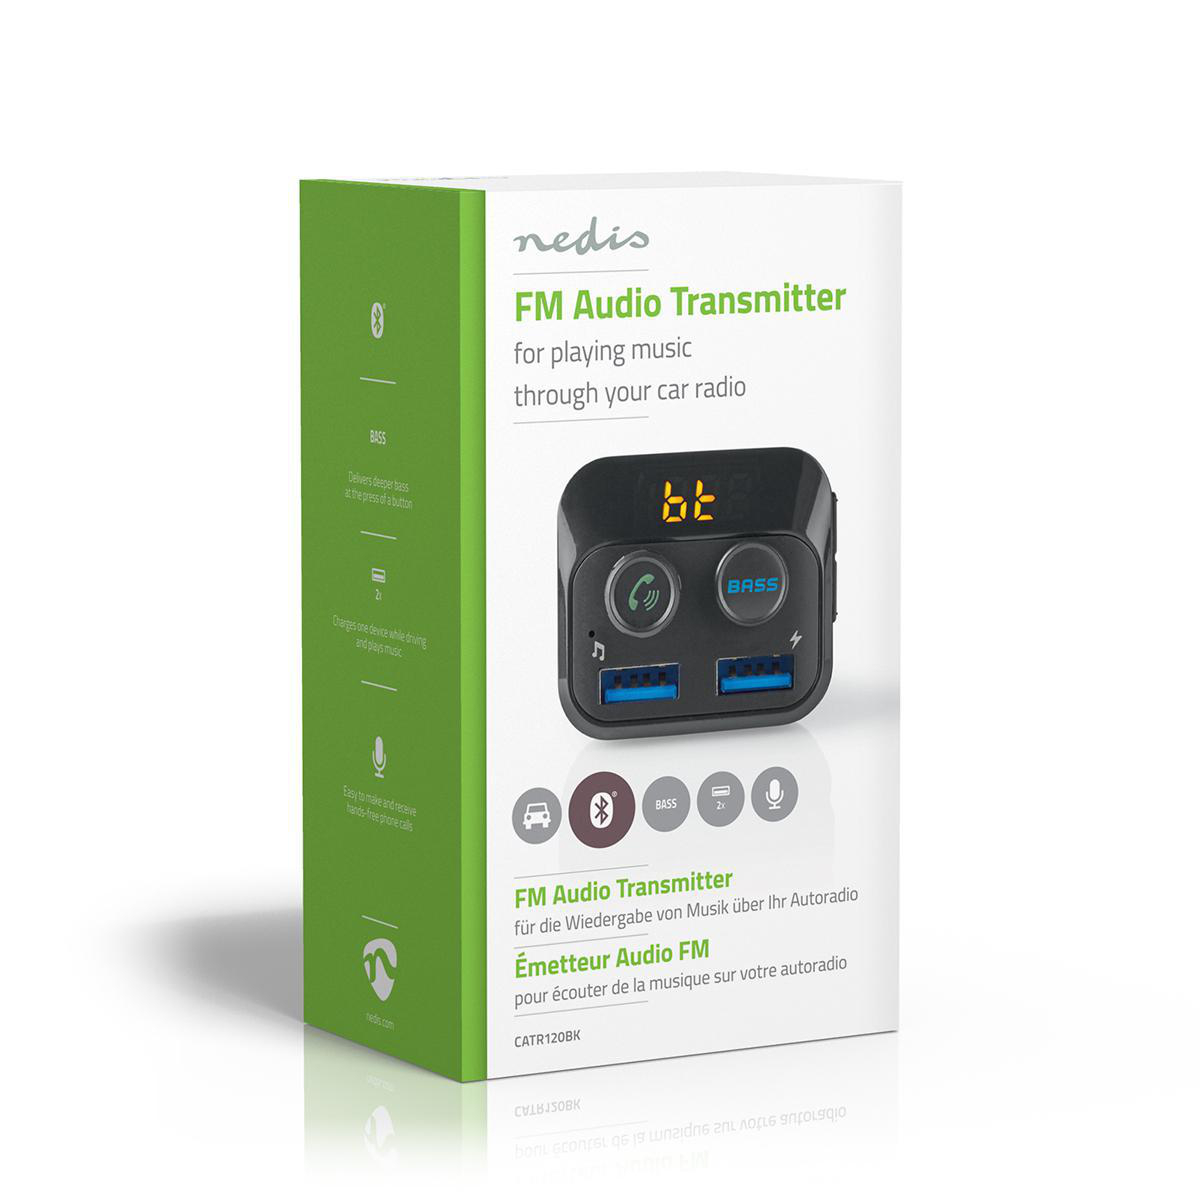 HZ Bluetooth Handsfree Bil Smartphones, tablets and PC